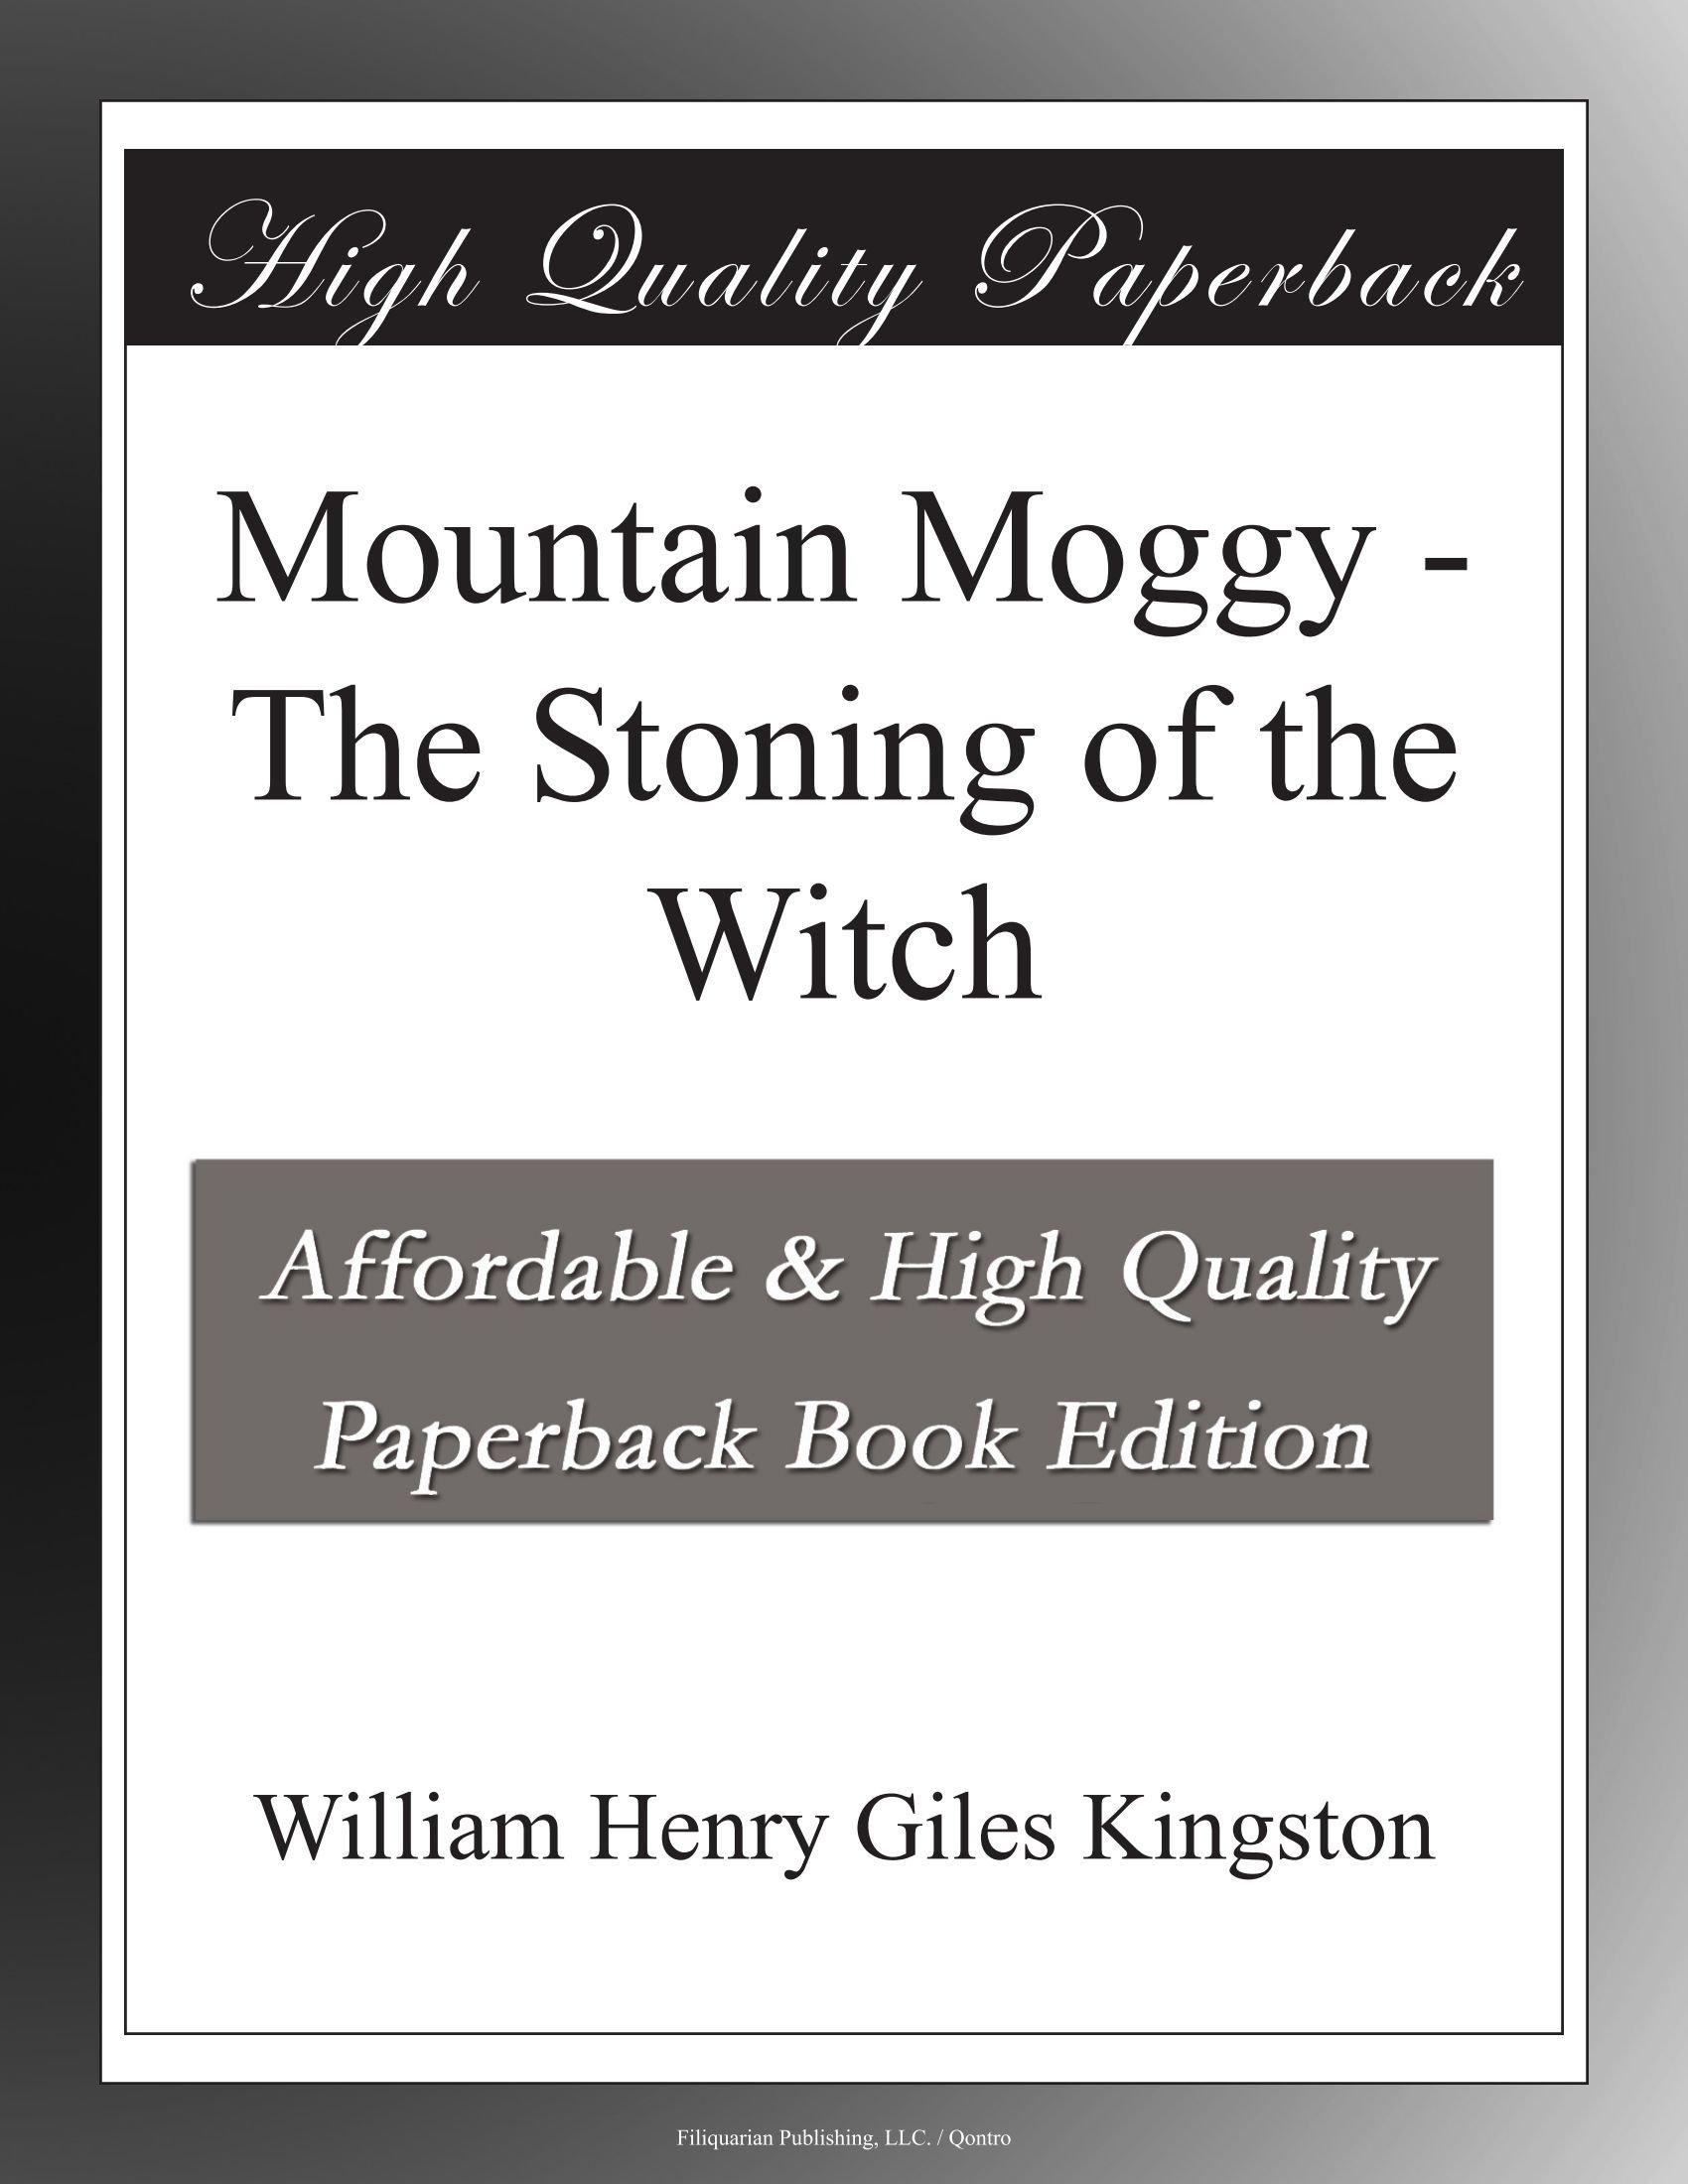 More Books by W.H.G. Kingston